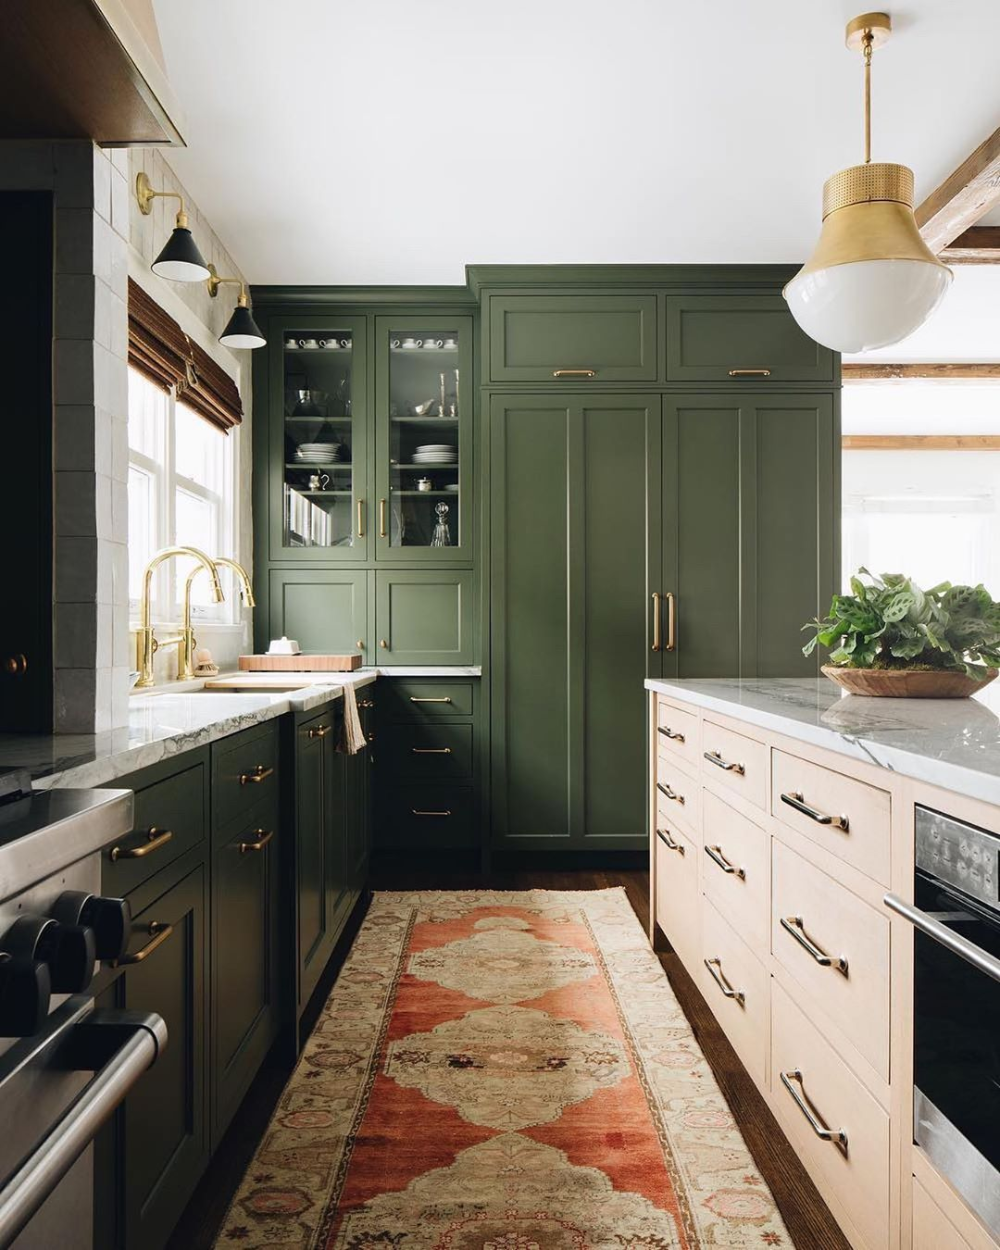 This green kitchen by @jeanstofferdesign is three parts ...